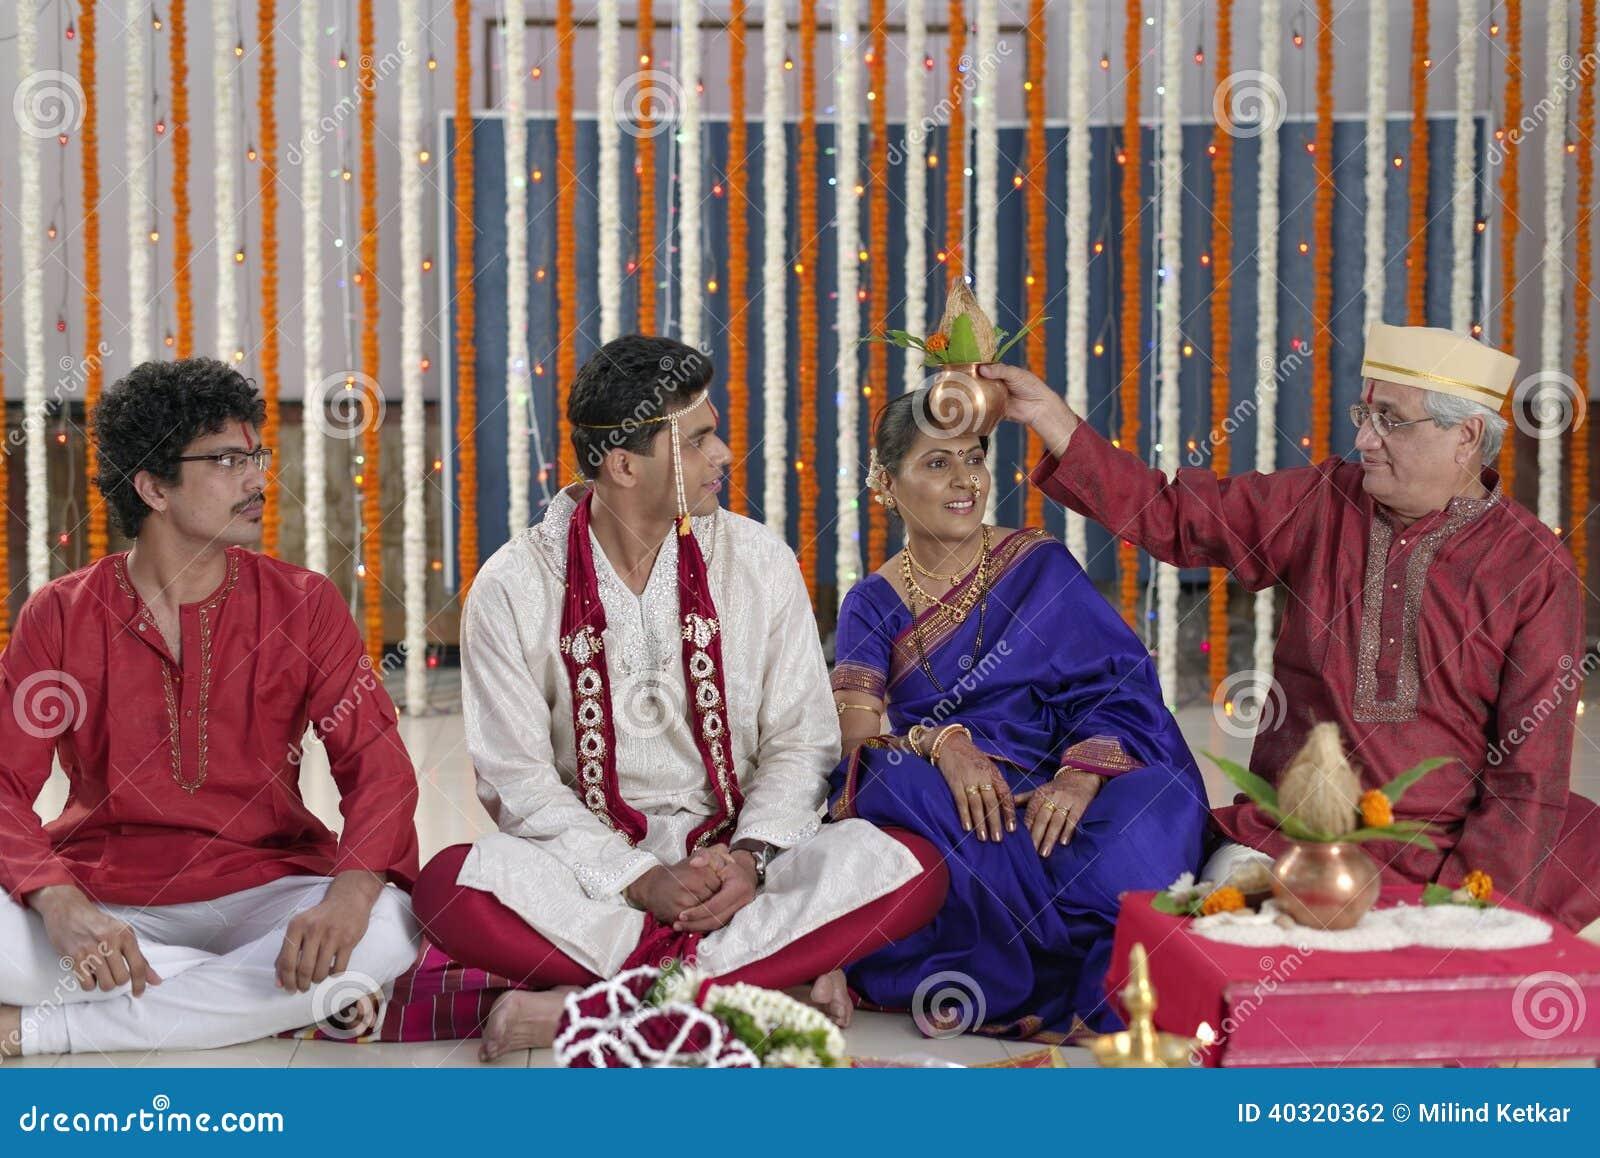 Ritual en la boda hindú india